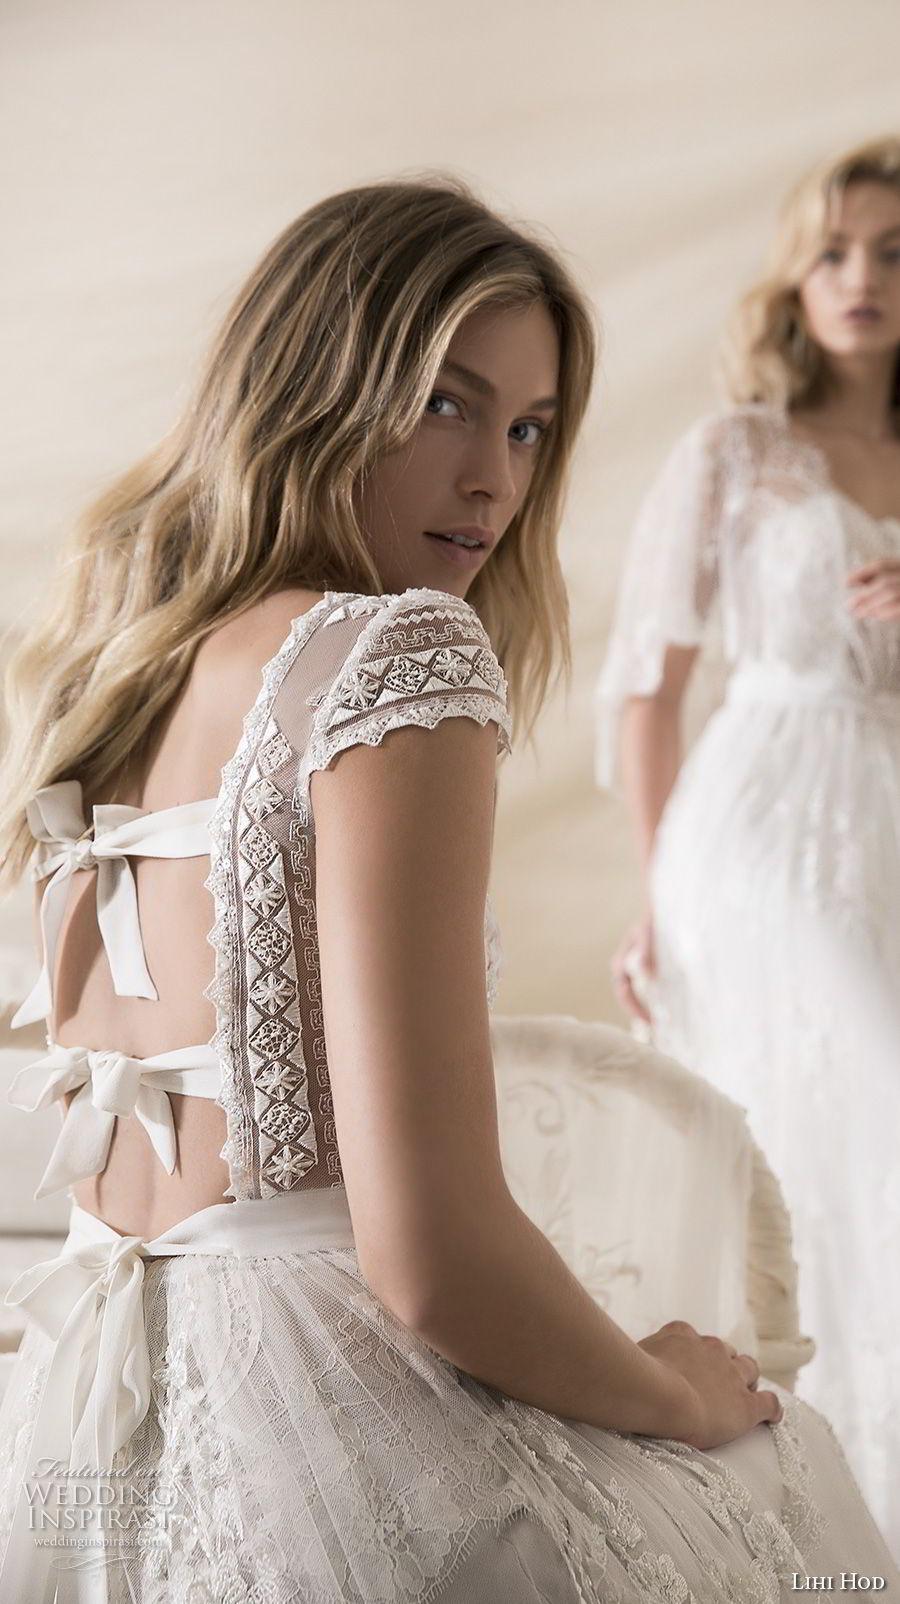 lihi hod 2018 bridal cap sleeves illusion jewel deep v neck heavily embellised bodice romantic bohemian soft a  line wedding dress open strap back sweep train (5)  zbv